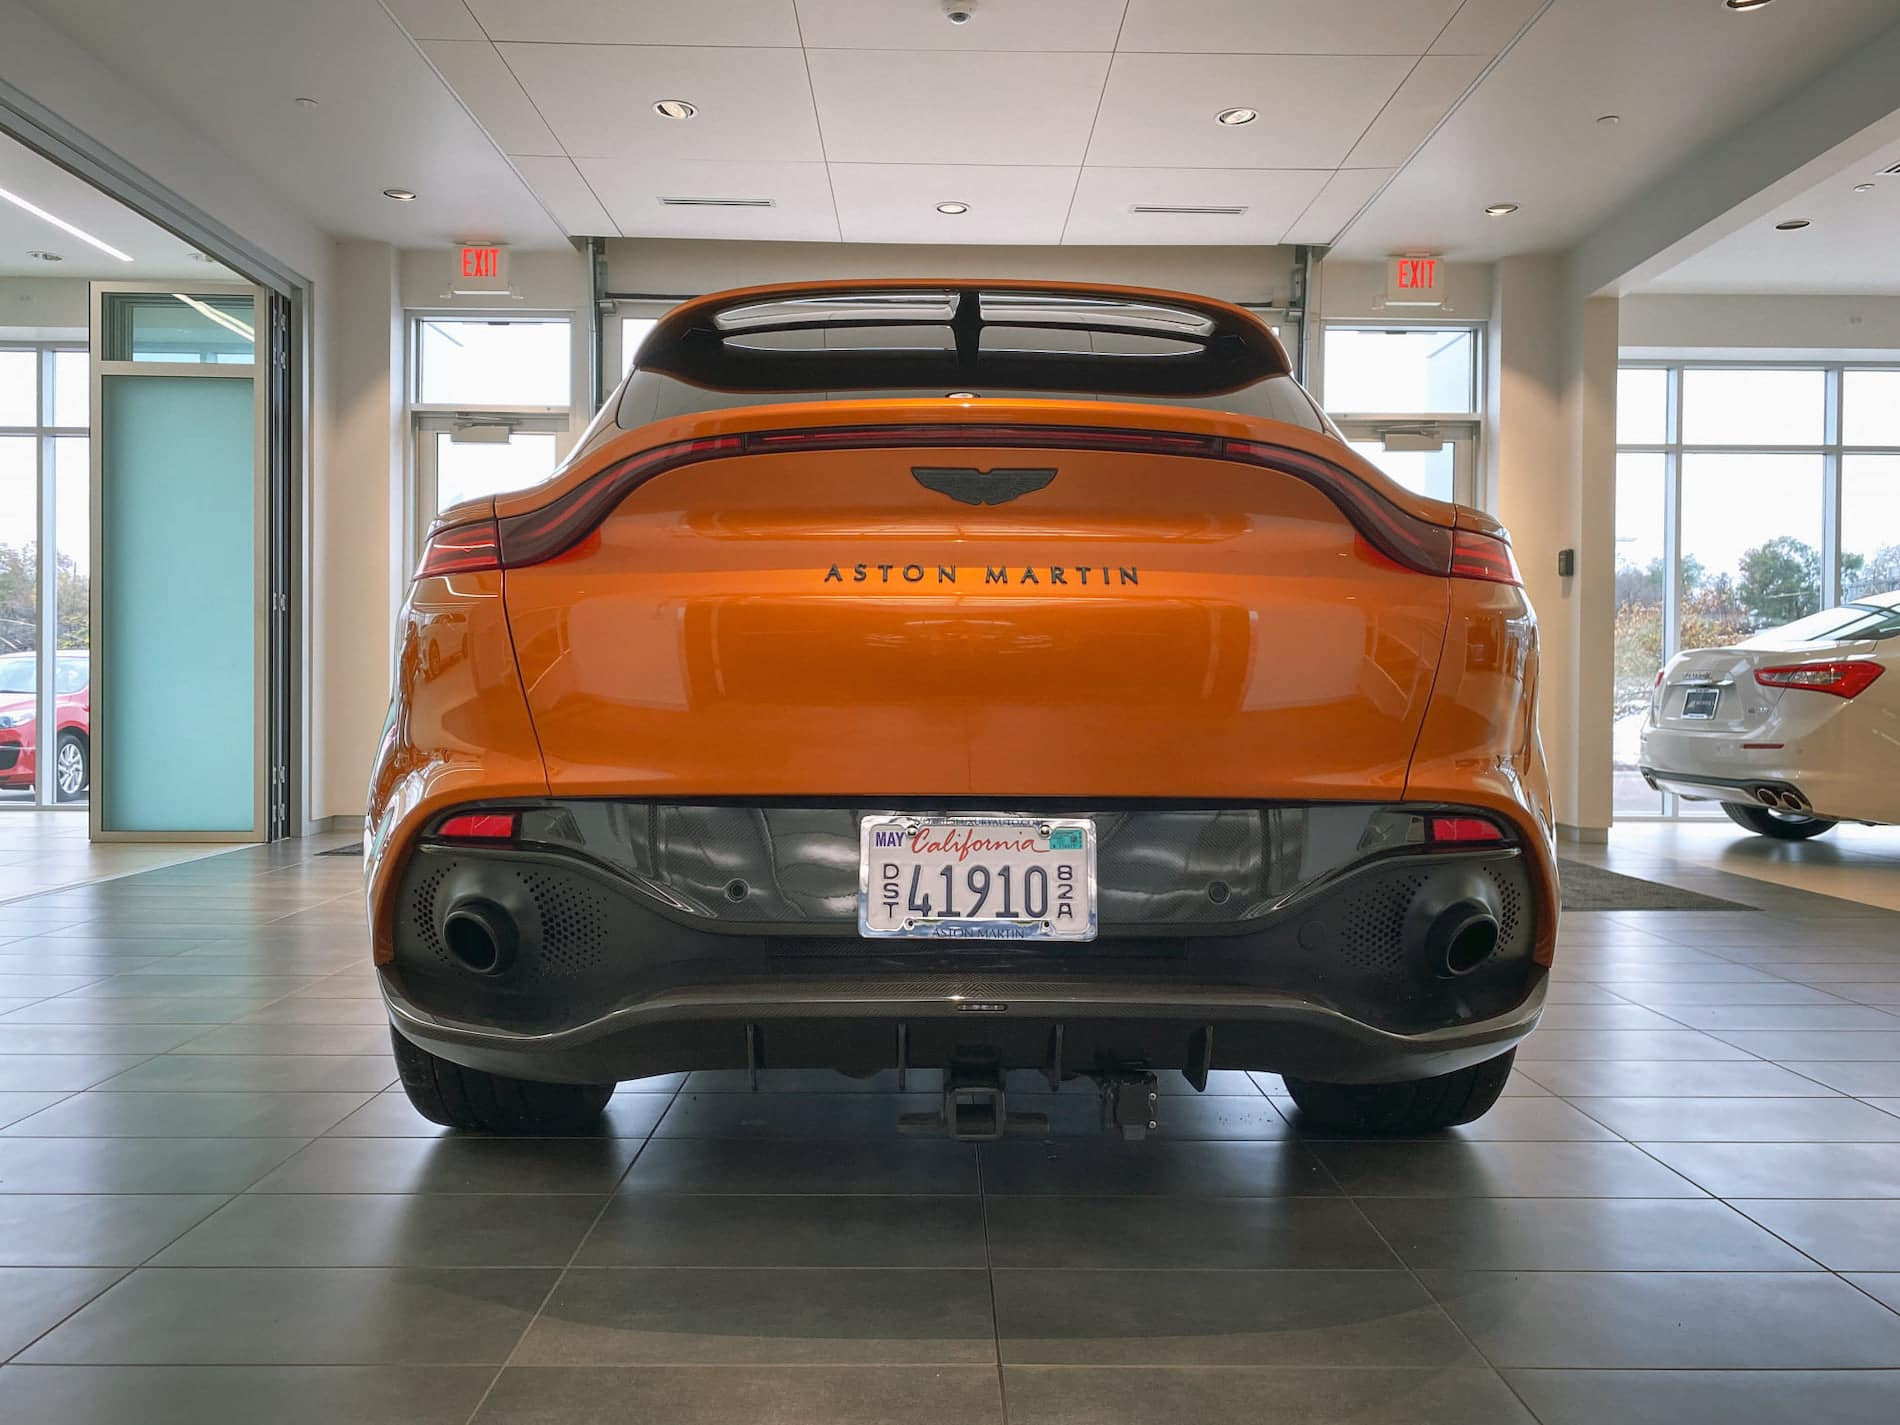 Aston Martin Minneapolis